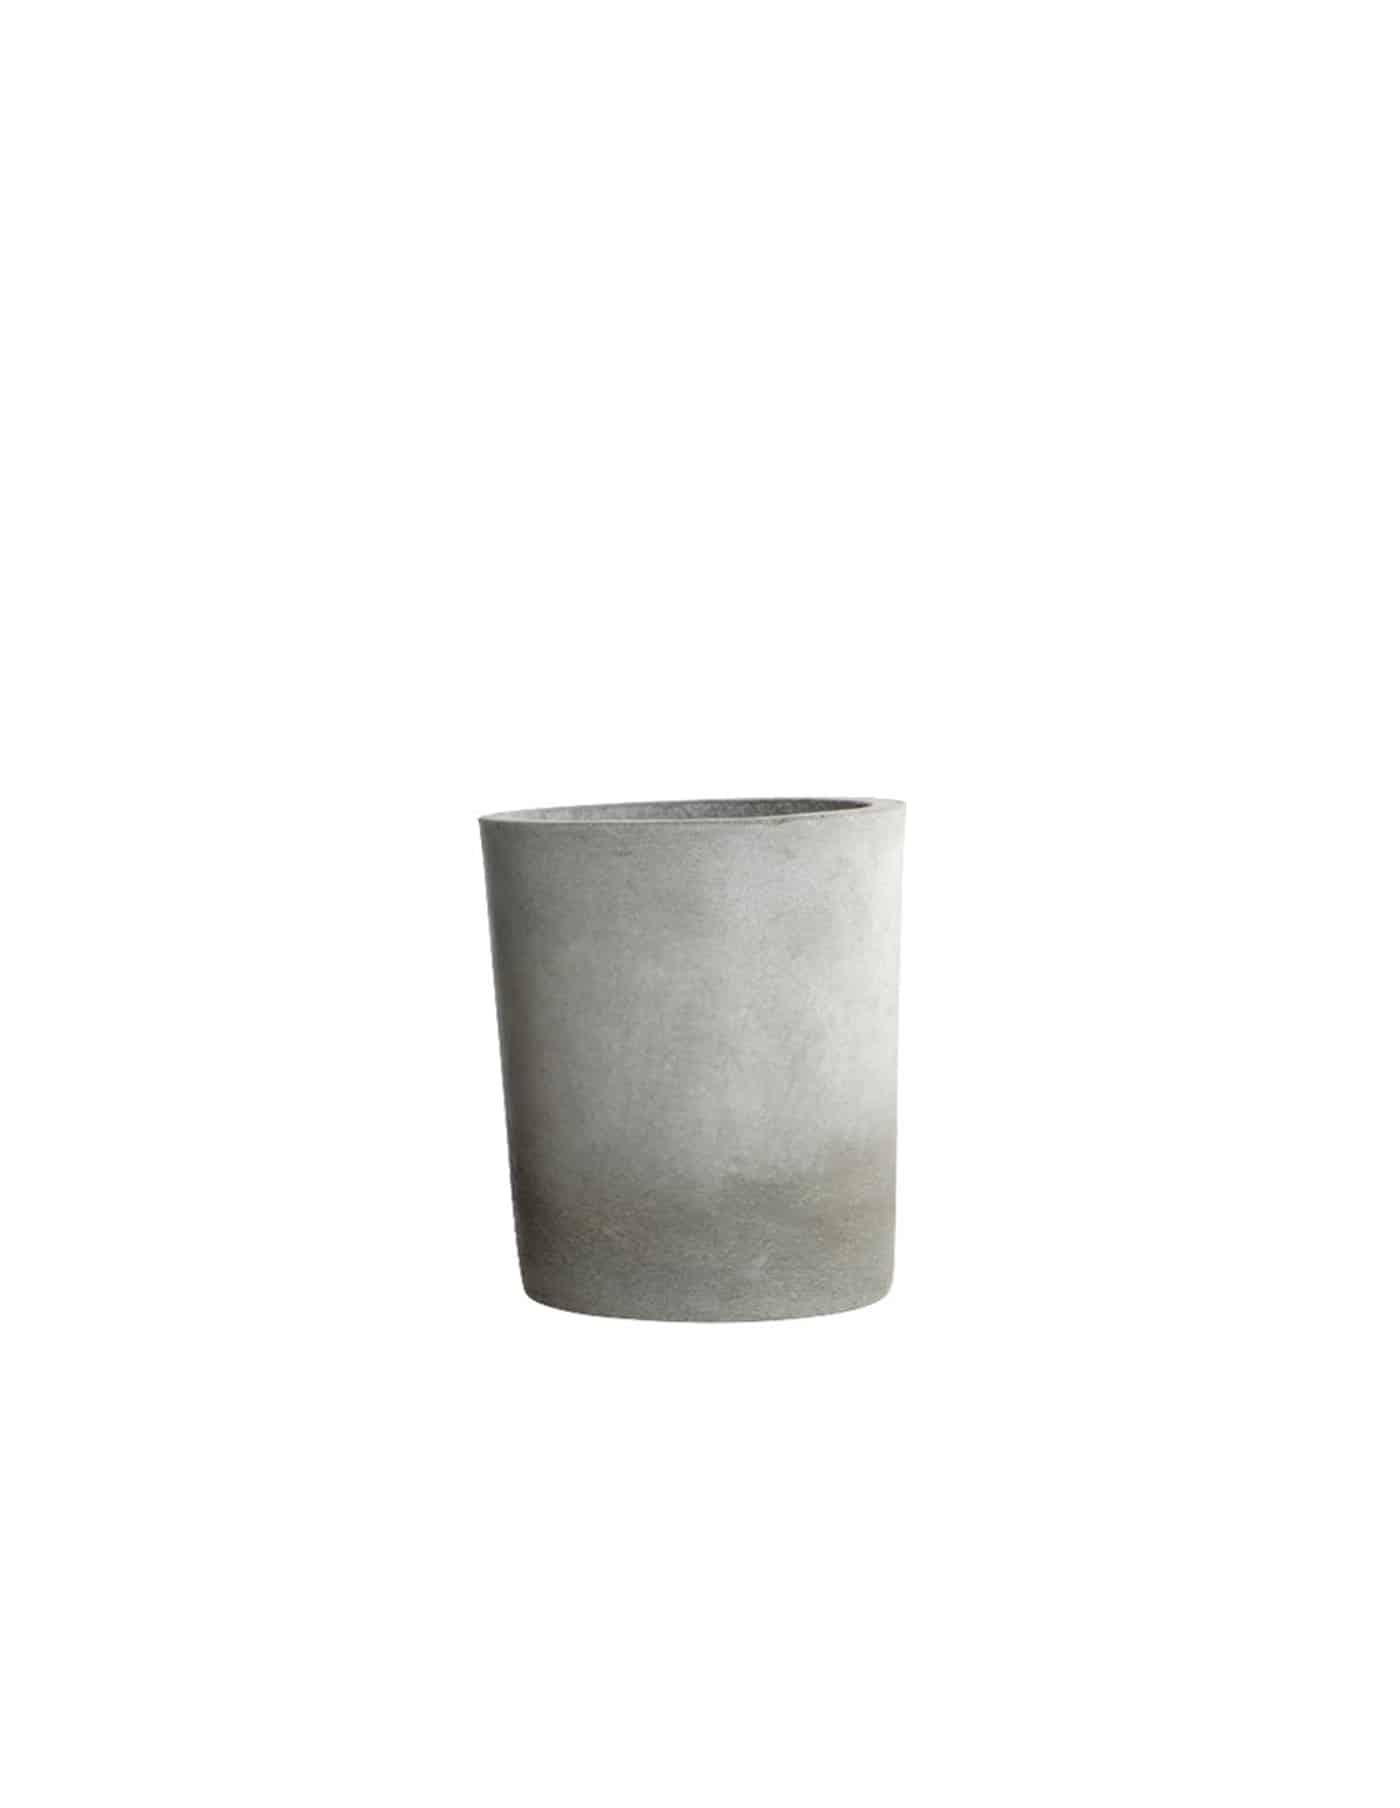 Medium Concrete Planter, House Doctor